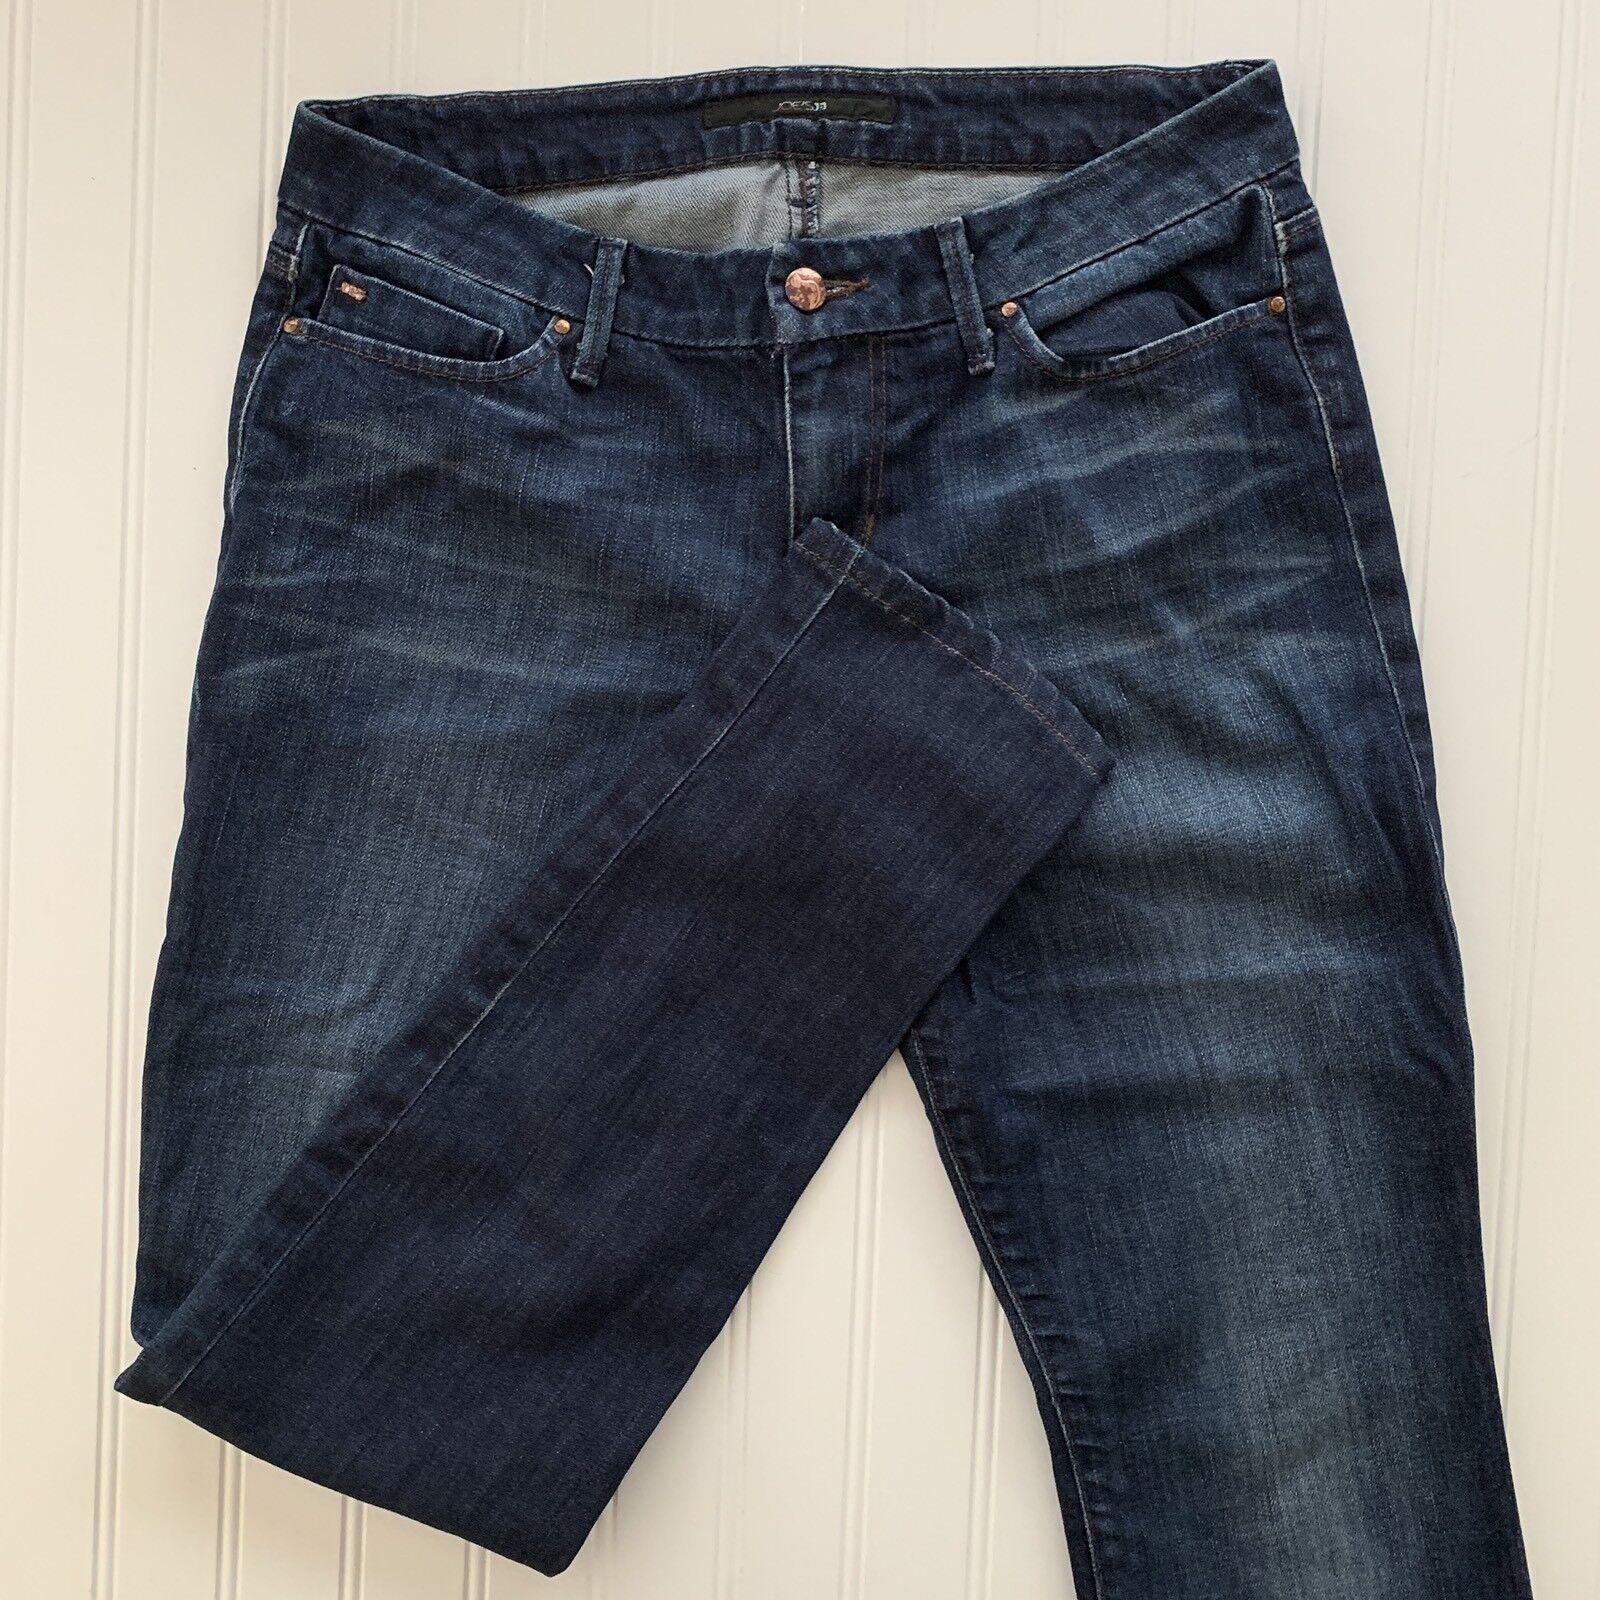 Joes Women's Chelsea Jeans Skinny Size 28 Medium Wash Inseam 30